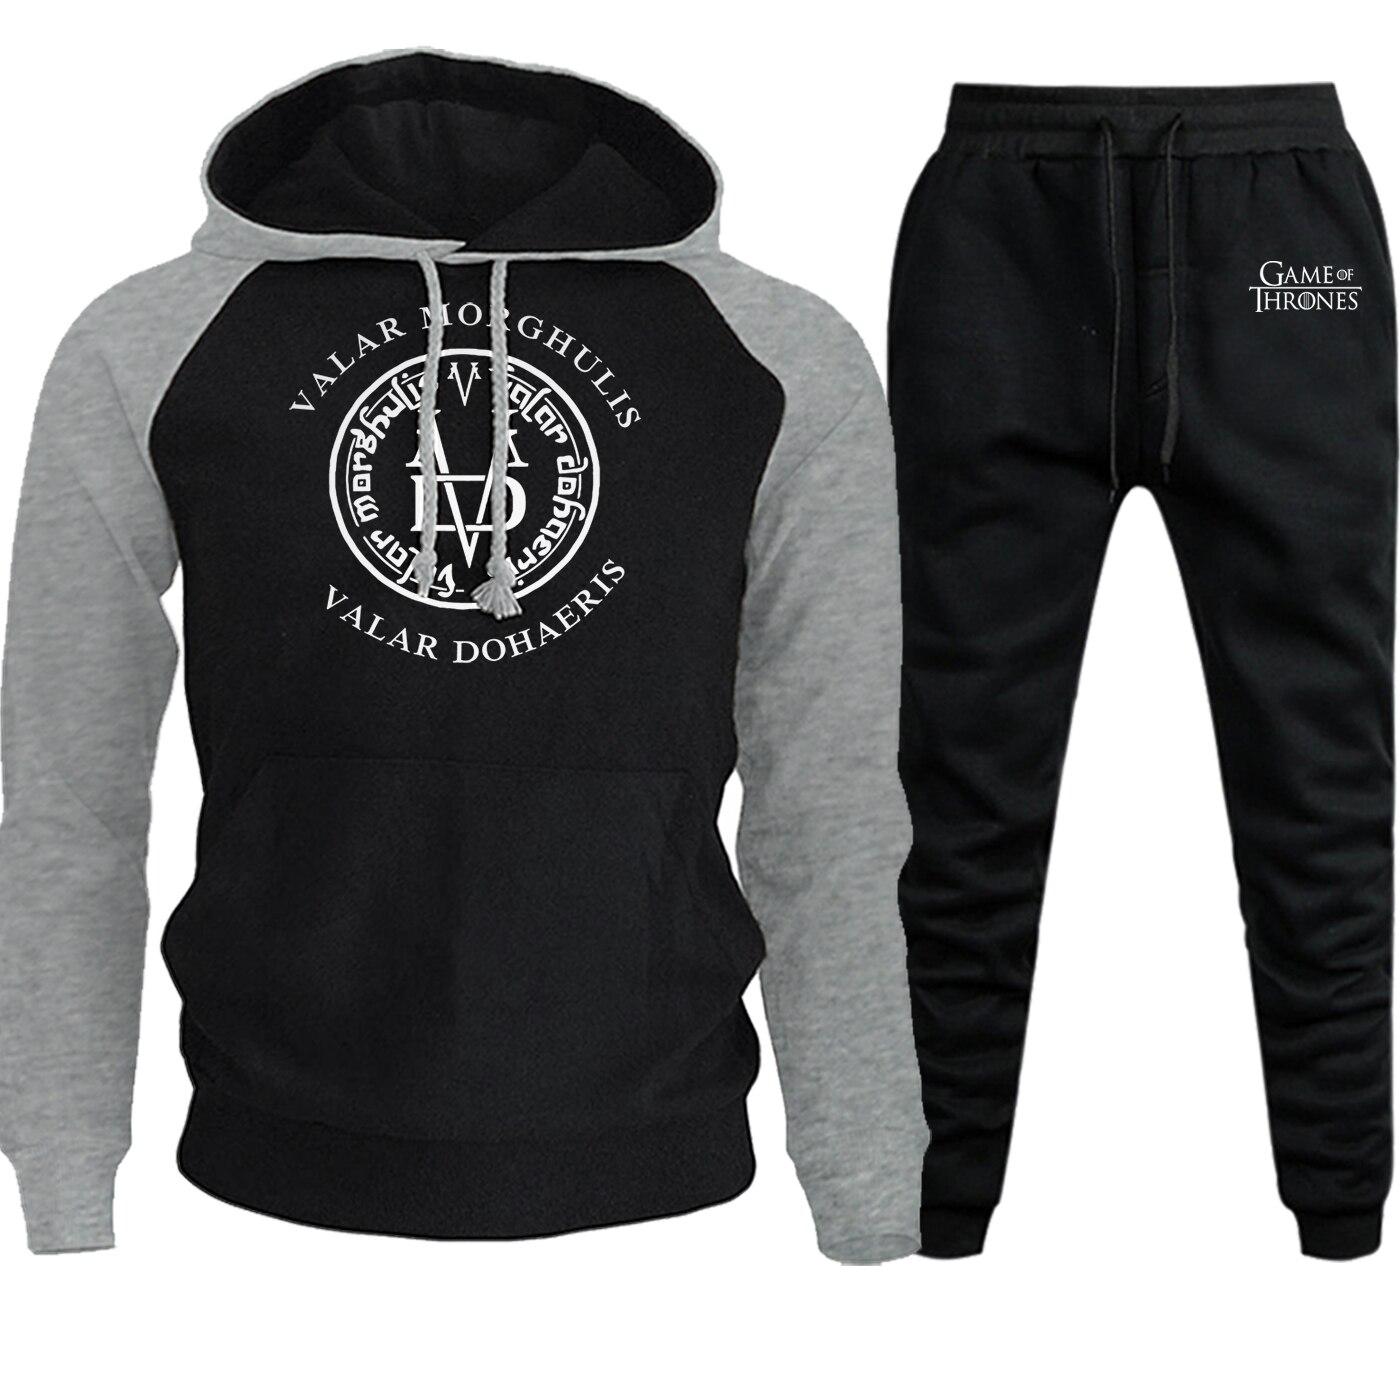 Autumn Winter 2019 Game Of Thrones Valar Morghulis Valar Dohaeris Streetwear Raglan Men Hoodie Fleece Pullover+Pants 2 Piece Set